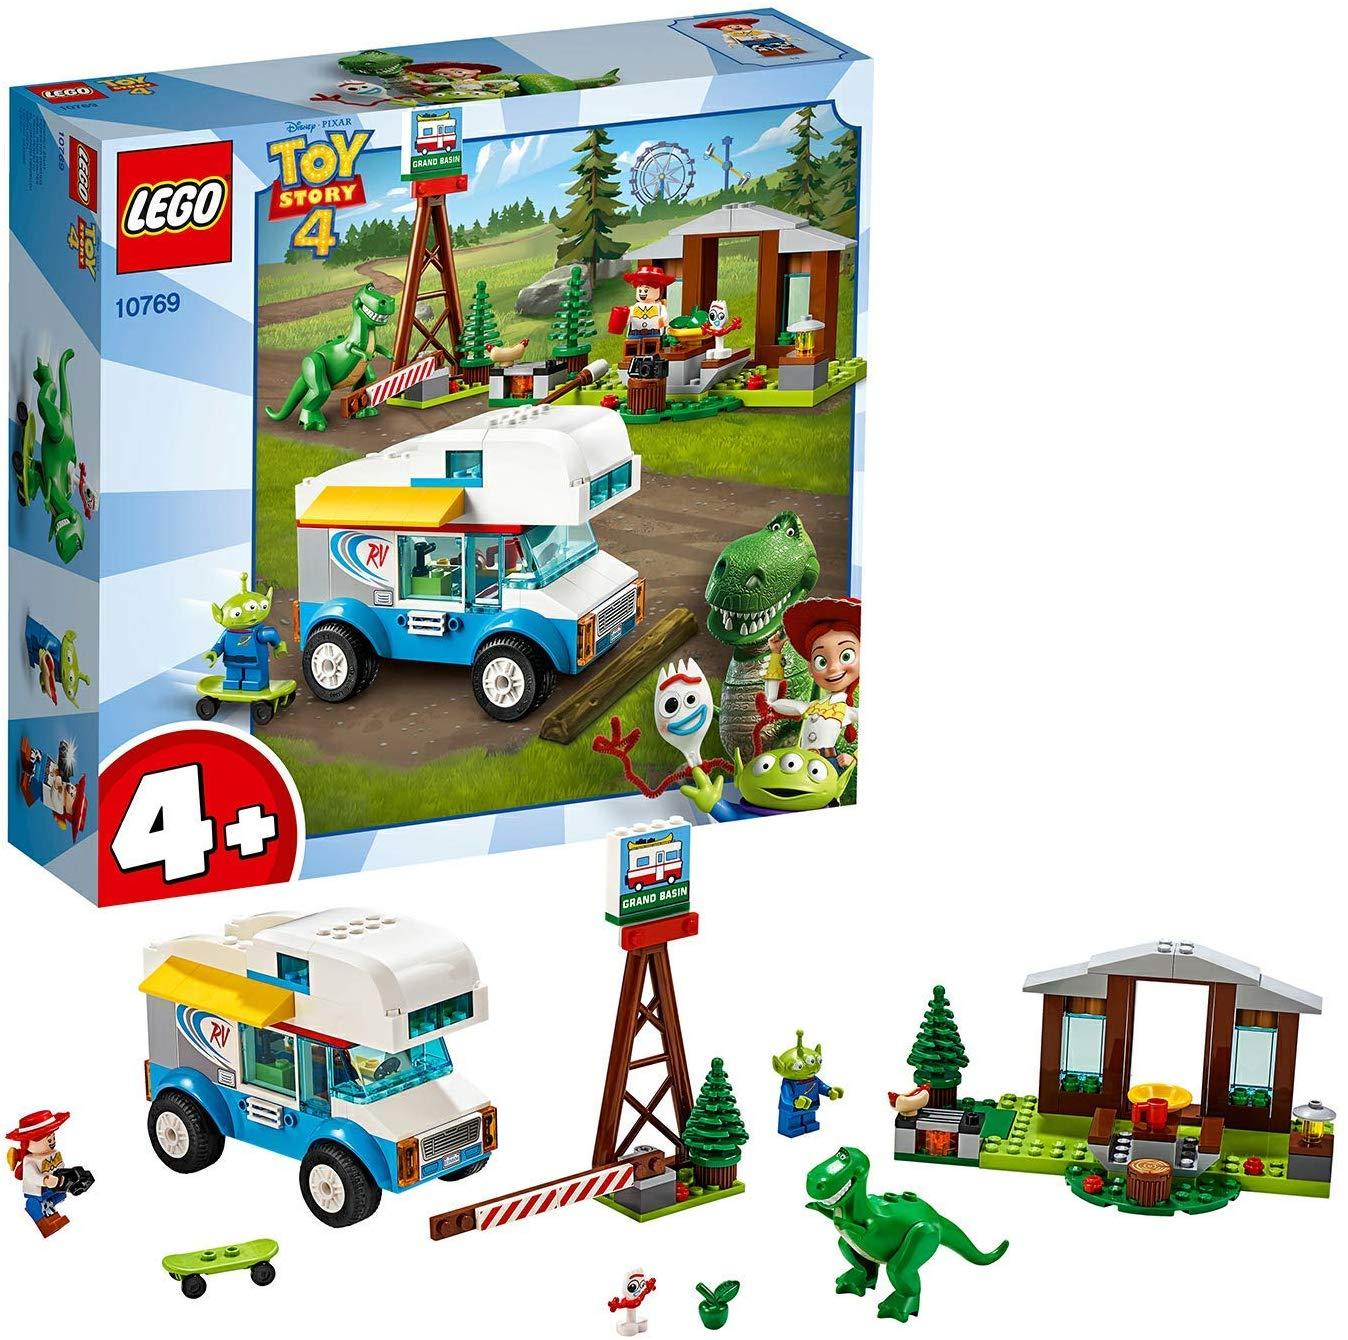 LEGO Toy Story 4 10769 RV Vacation £20 @ Amazon